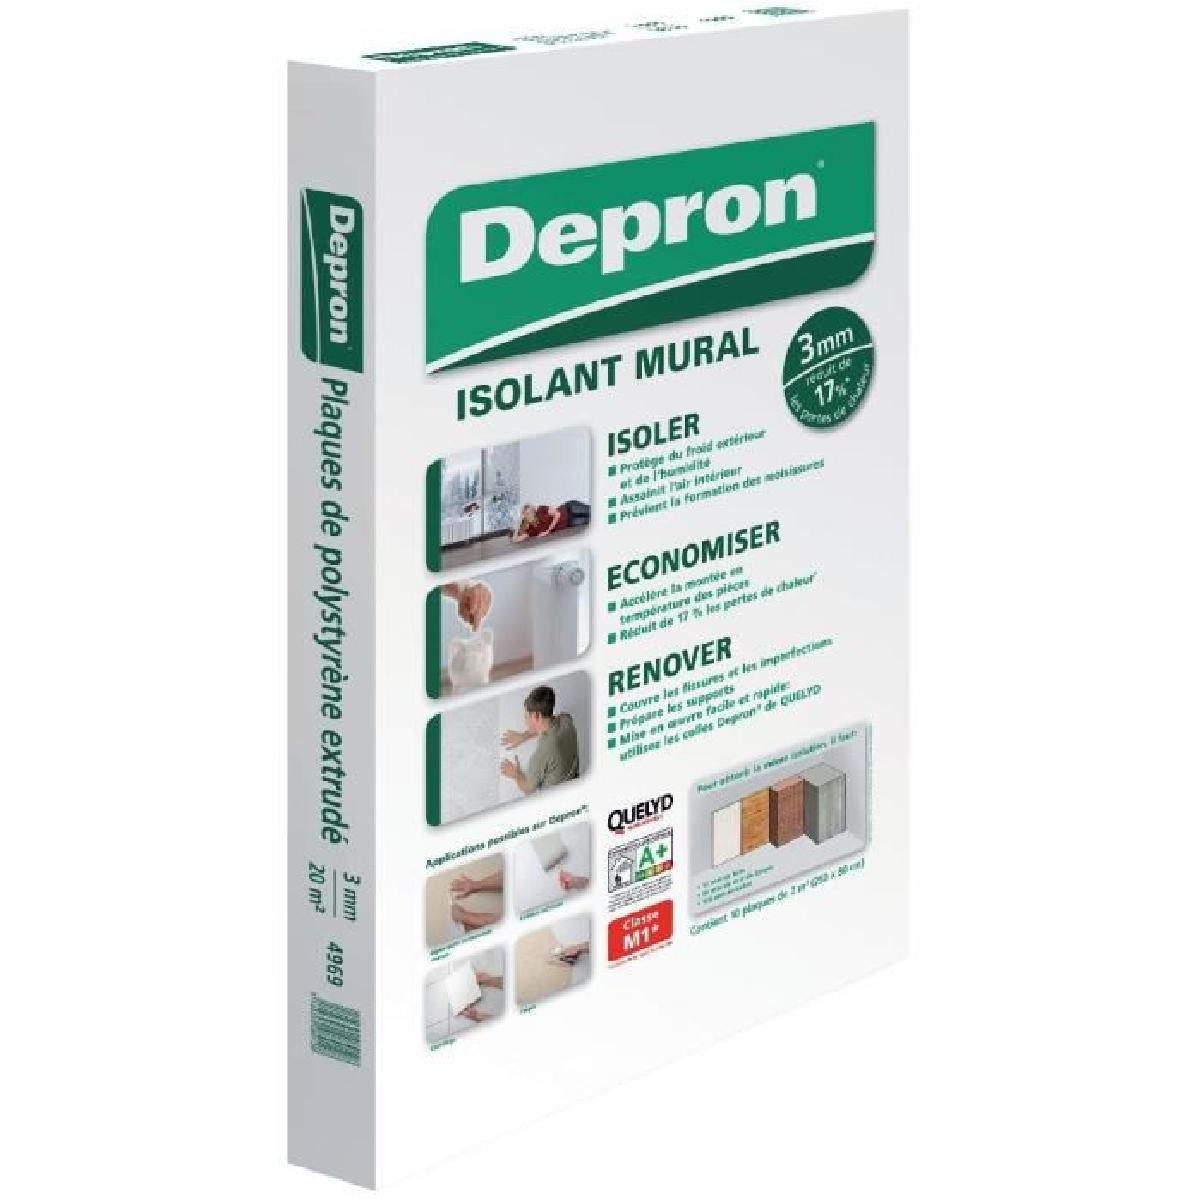 plaque depron 3mm